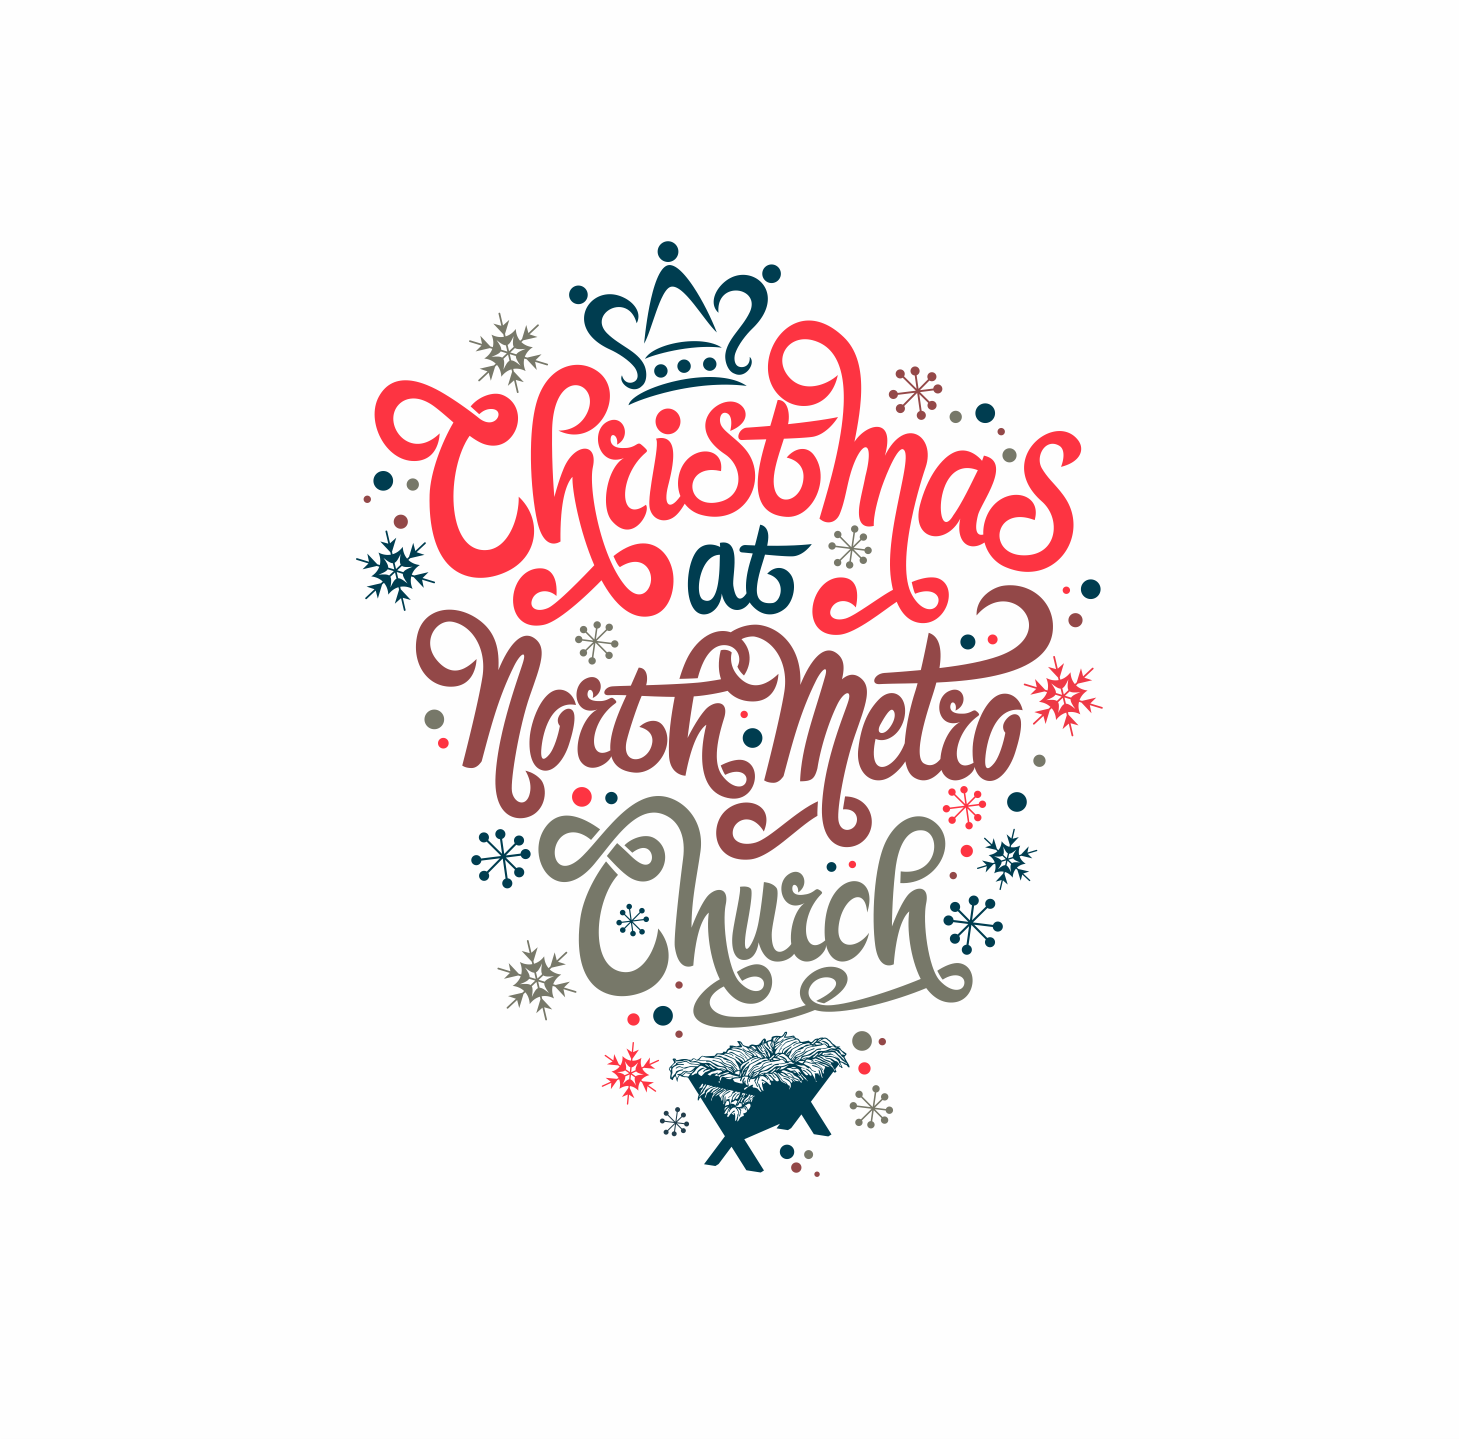 6 merry christmas